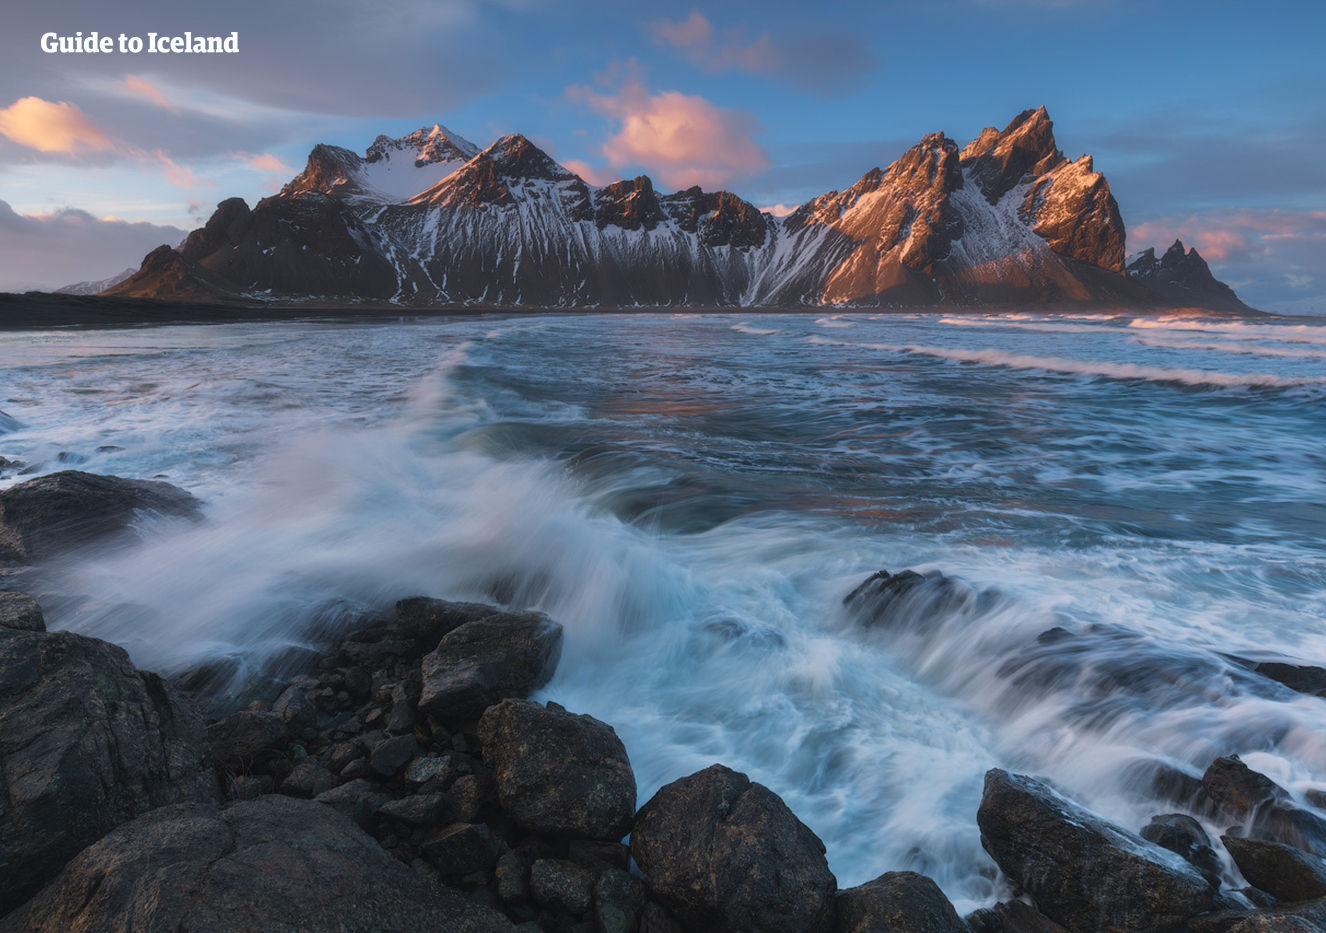 Stokksnes半岛上的Vestrahorn山造型奇特,极受摄影爱好者的欢迎